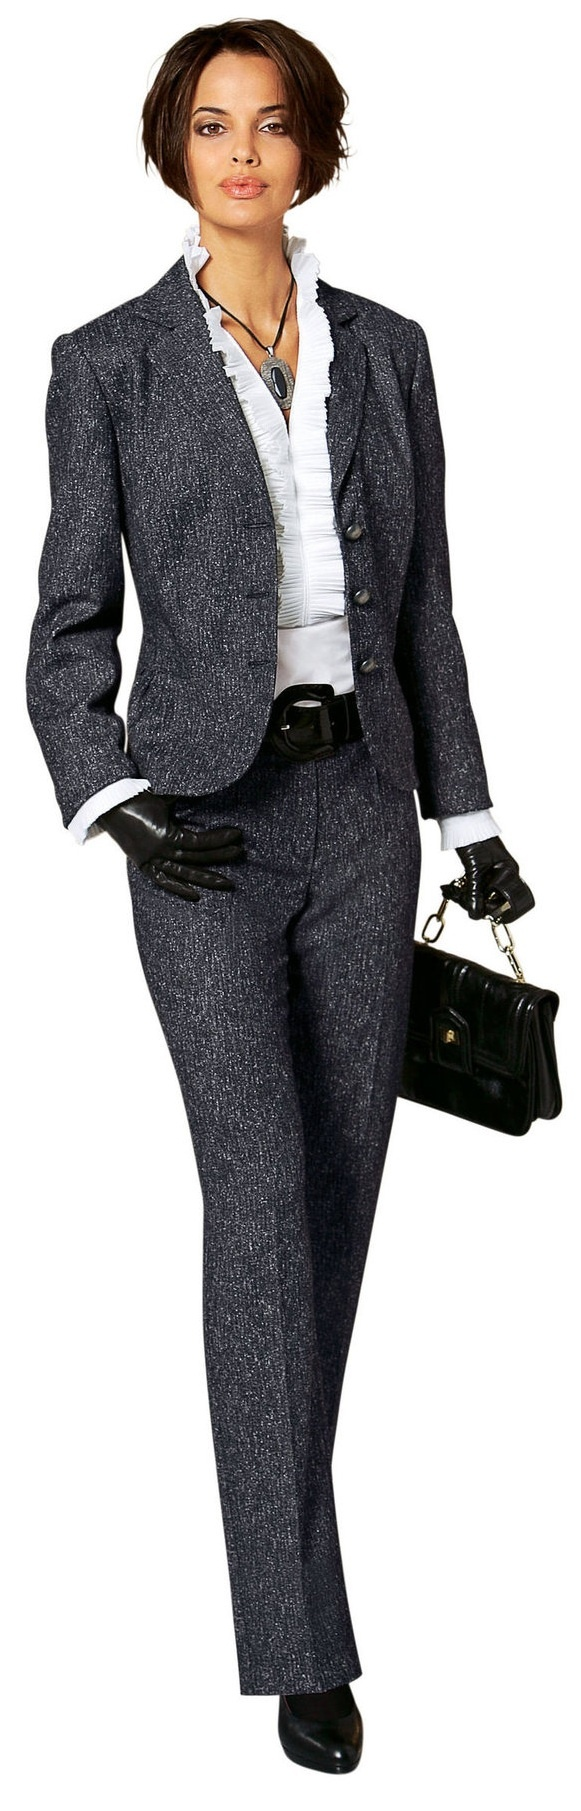 Elegant Aa Women S Office Wear Pinterest Suits Dresses And